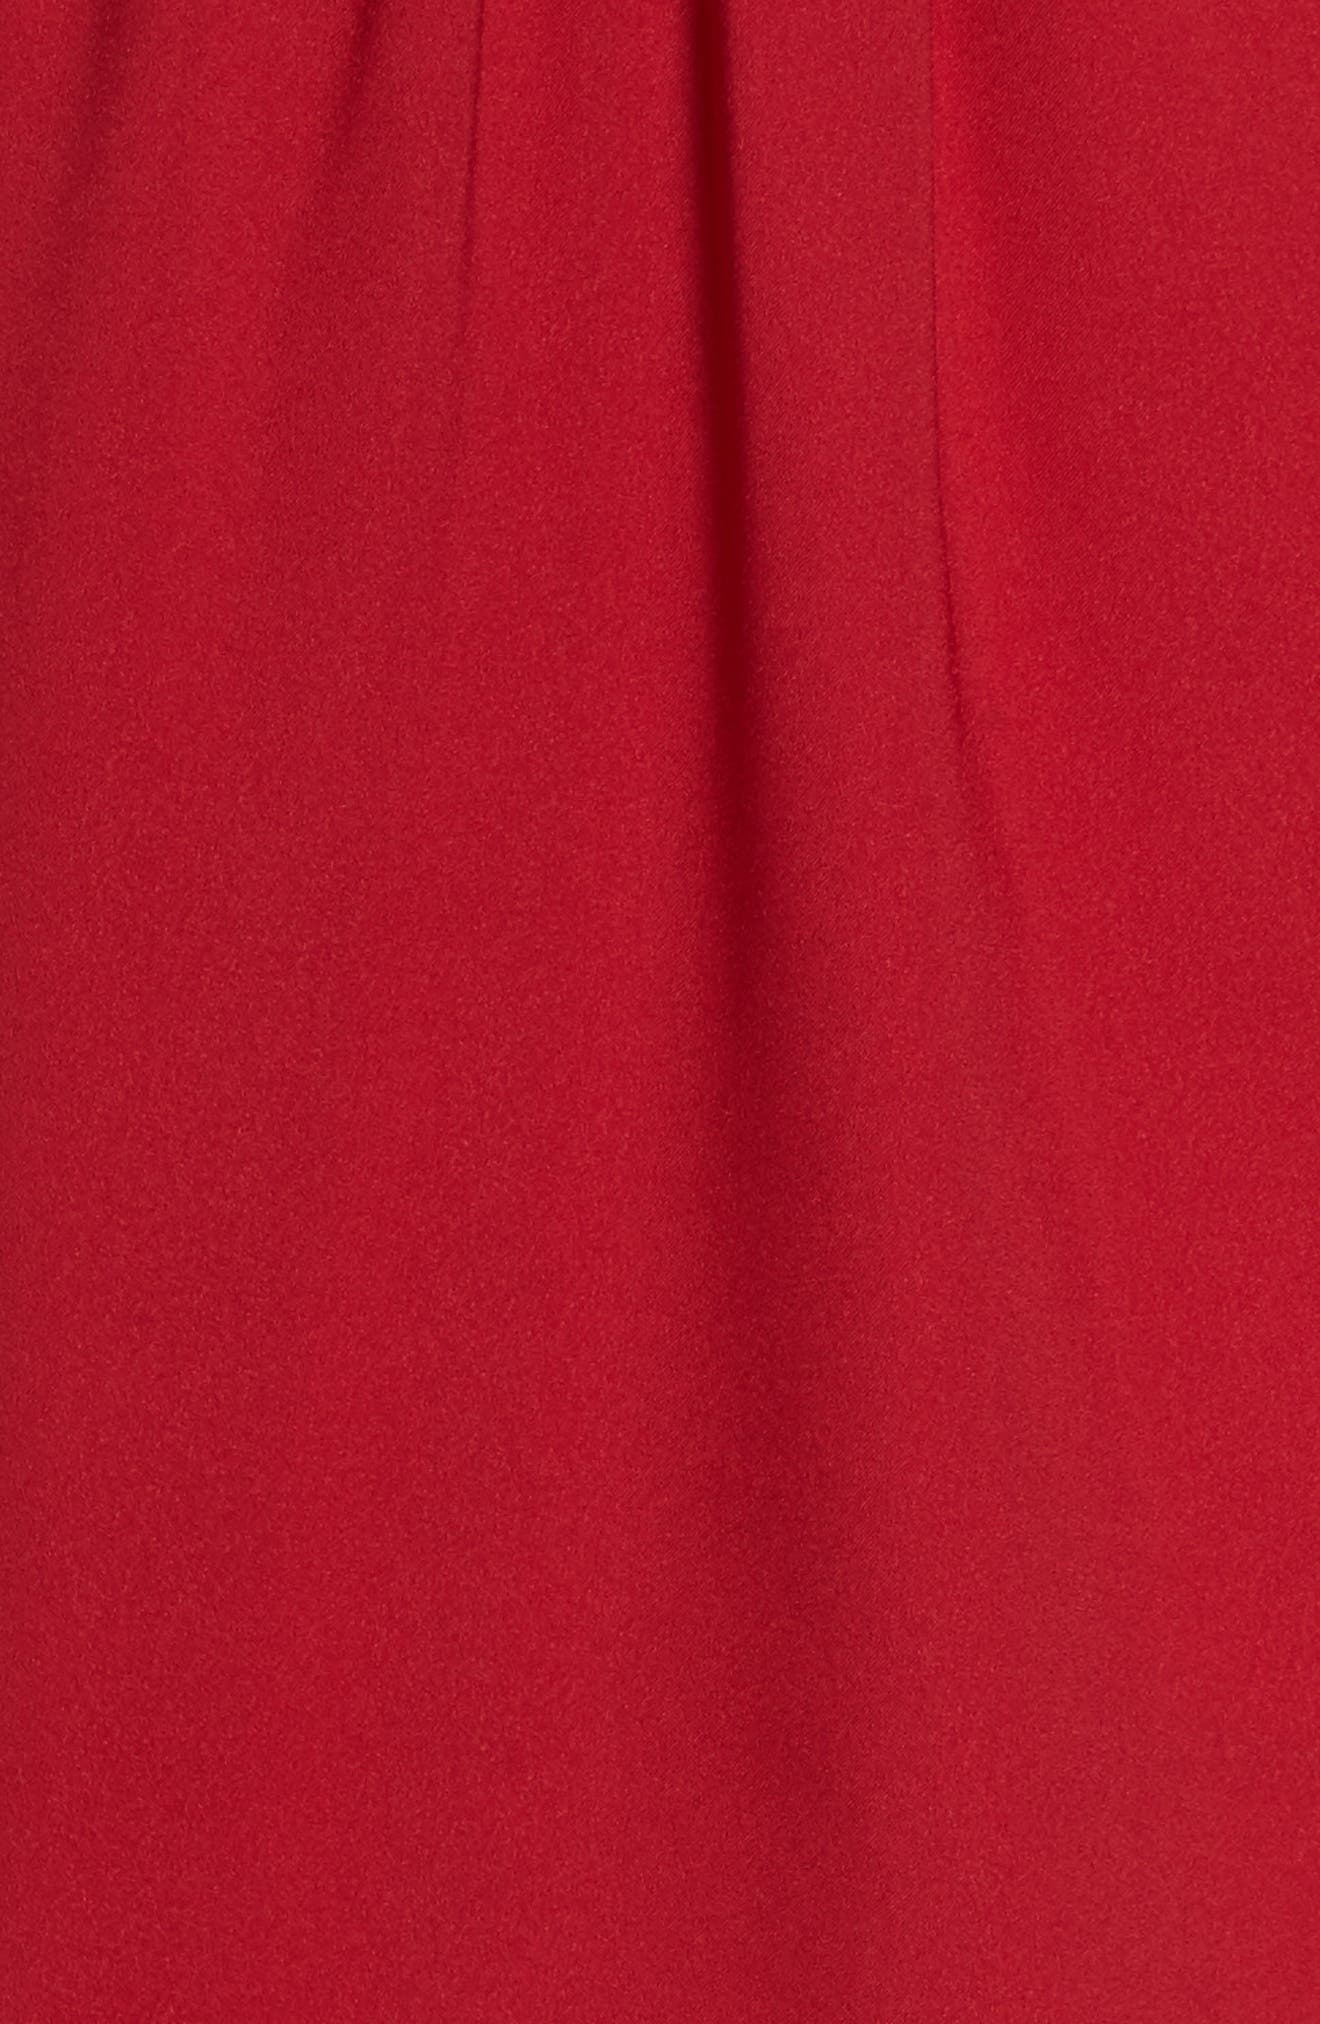 Cold Shoulder Dress,                             Alternate thumbnail 5, color,                             Cherry